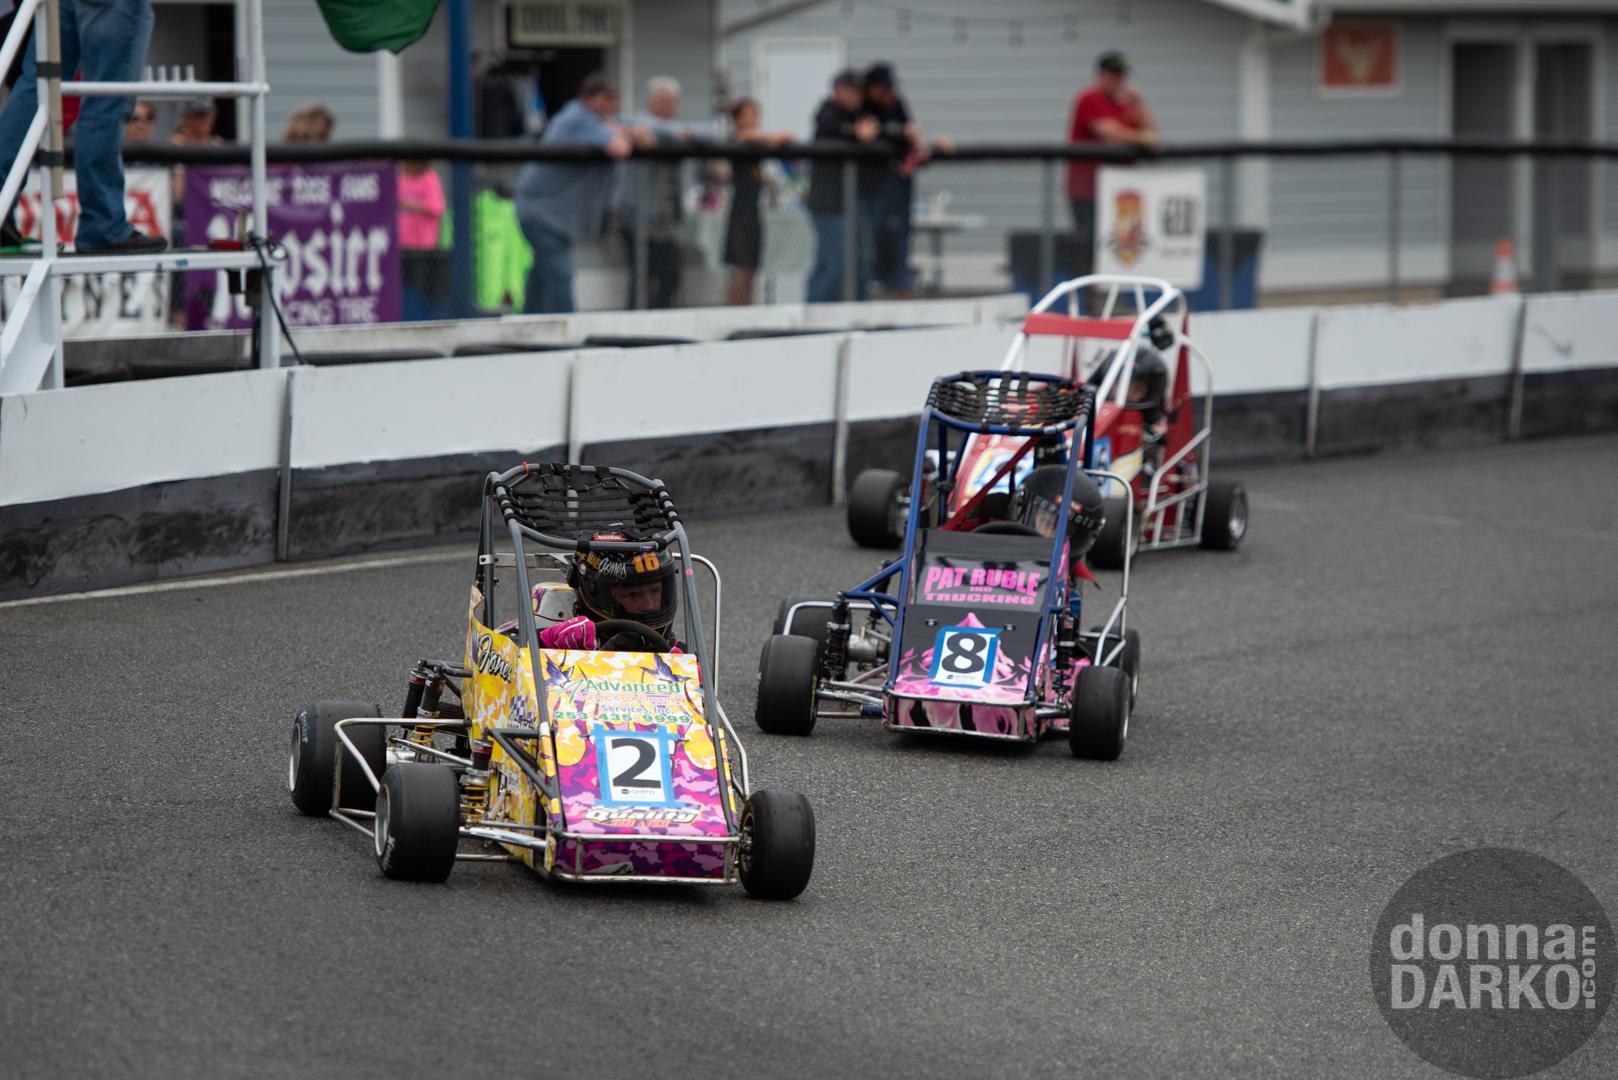 QWMA (Racing) 8-11-2019 DSC_6341.jpg